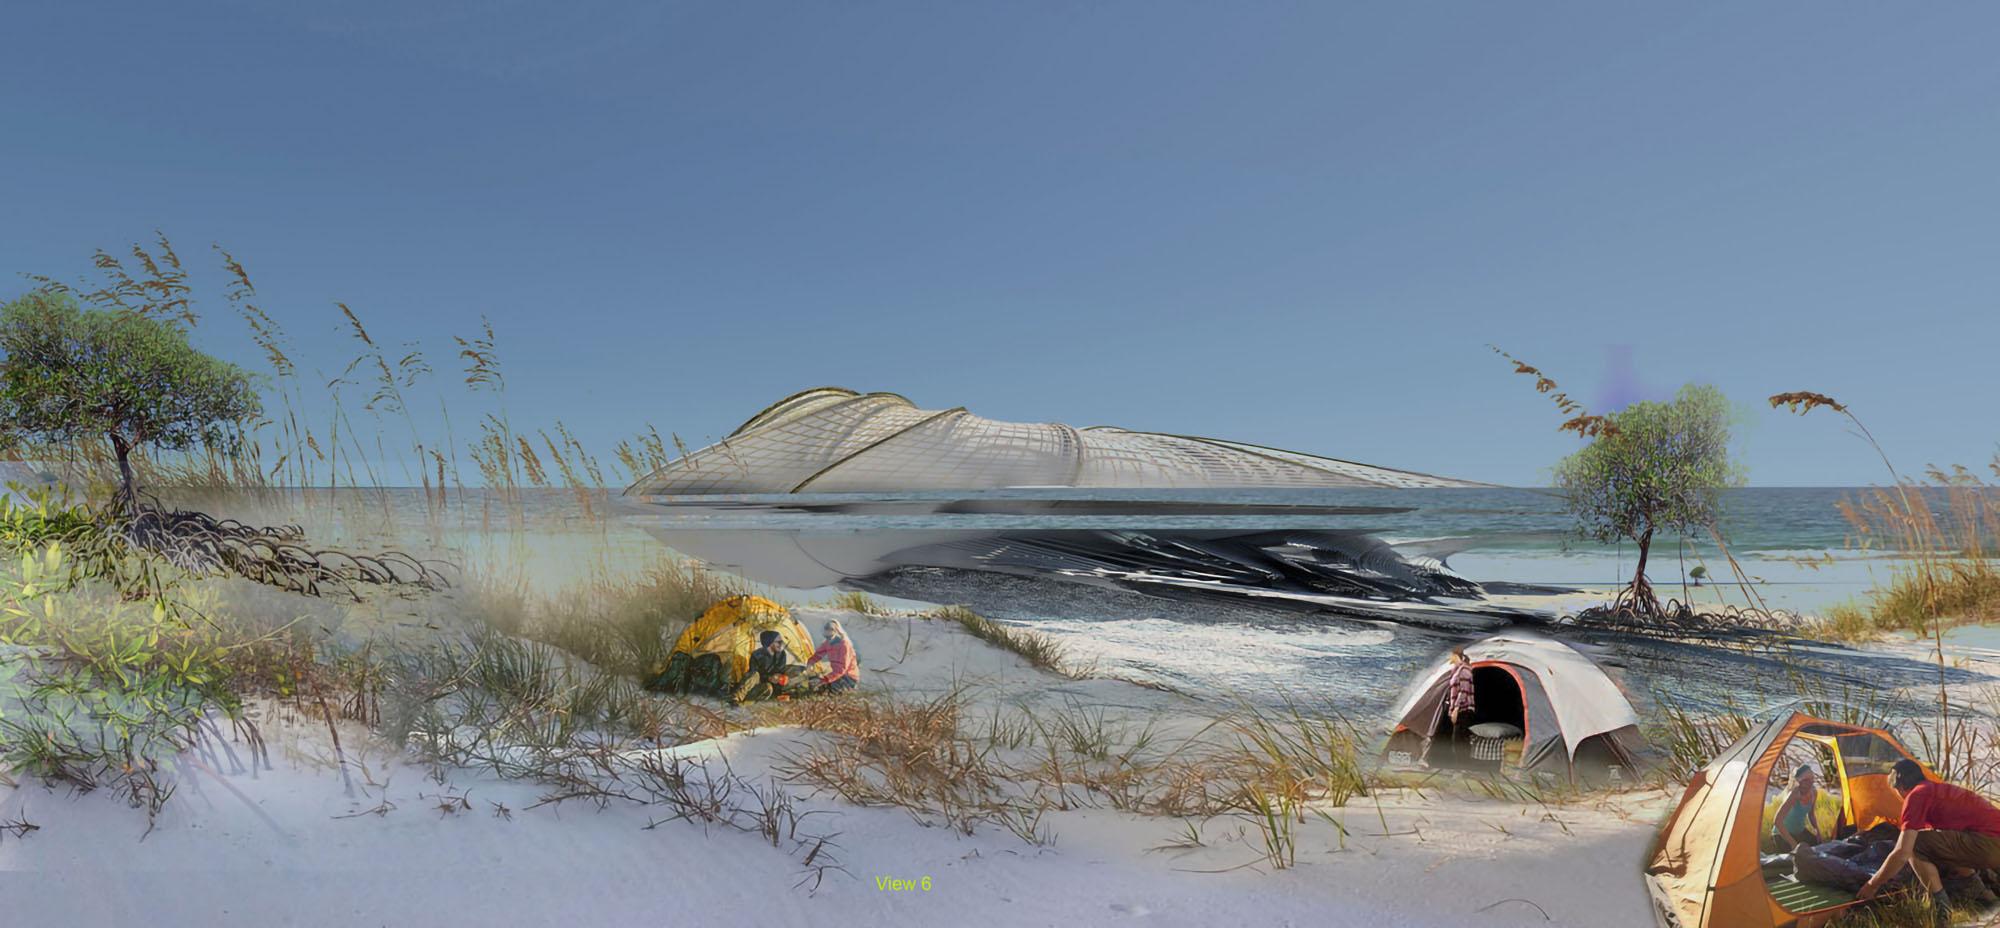 Recycled Ocean Plastic Resort - Photo Margot Krasojević